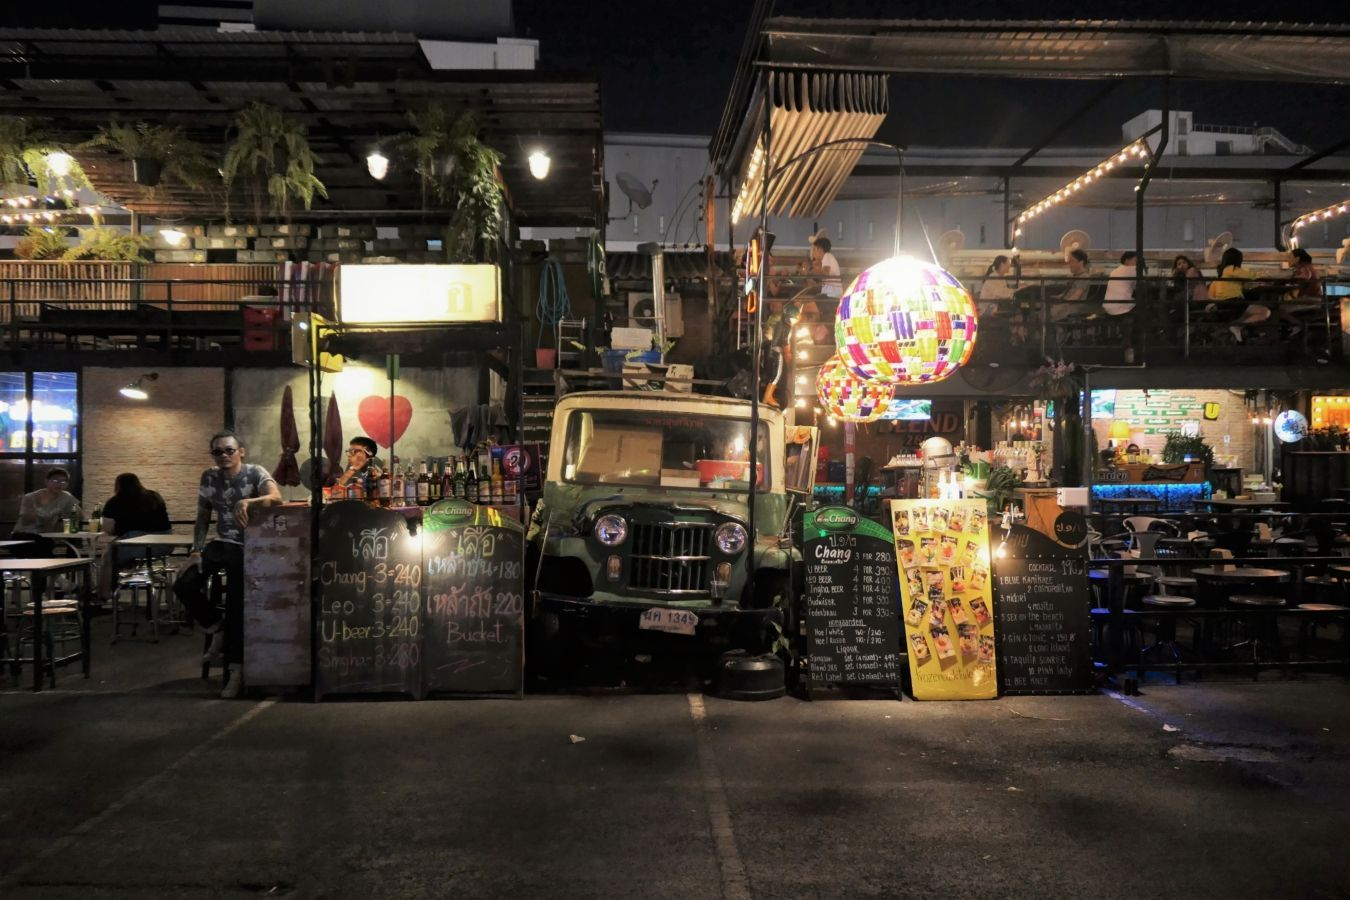 Bar curioso en el mercado de Rot Fai | Gastronomadistas